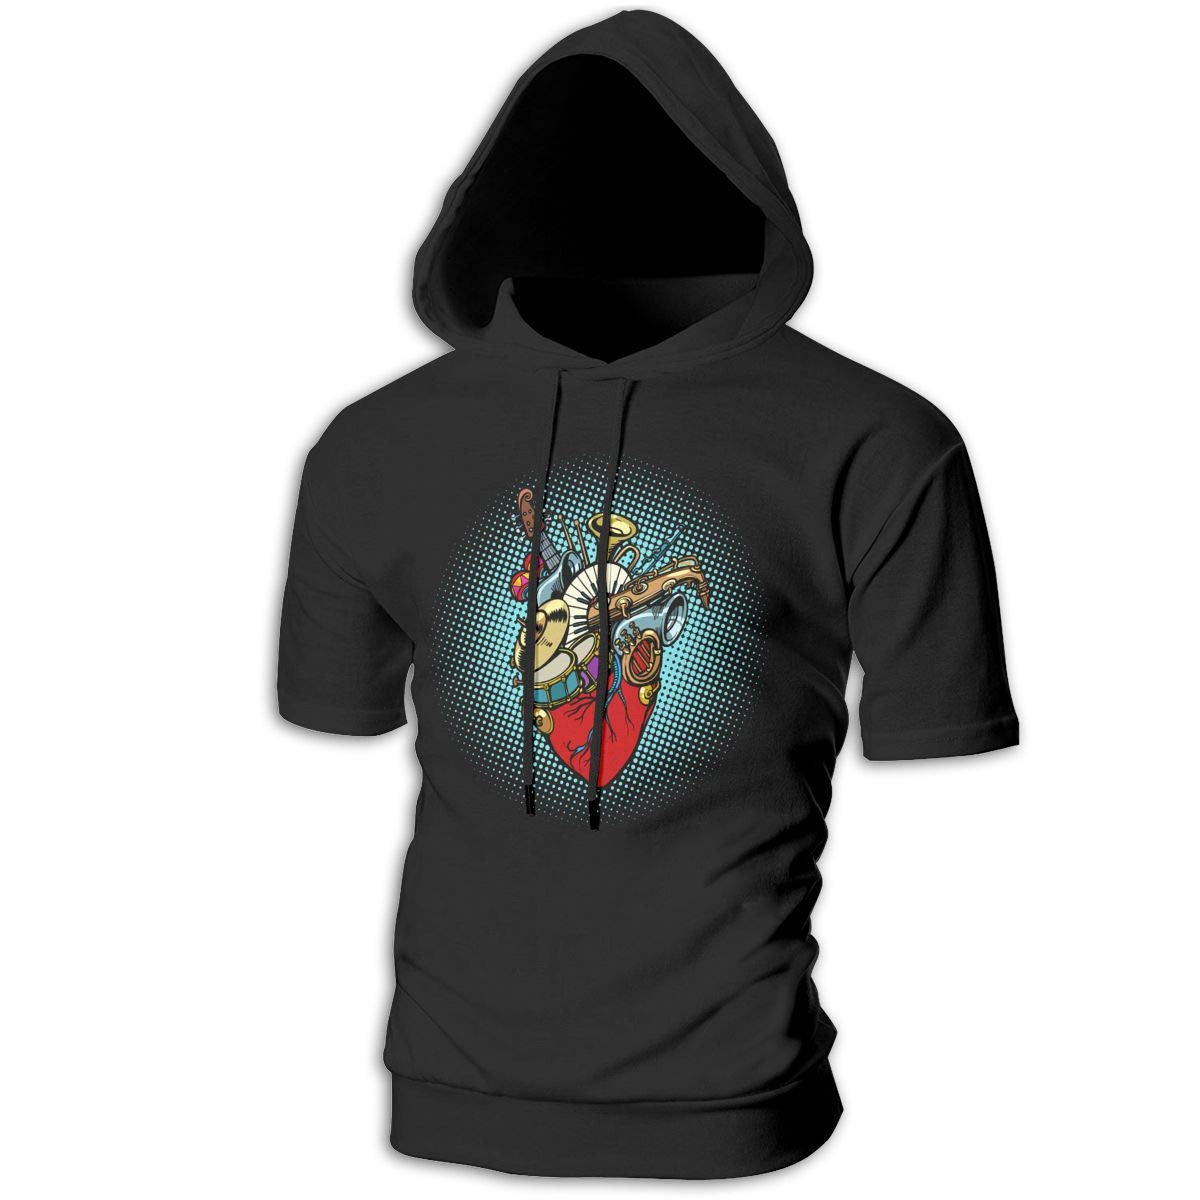 Hengteng Designed New Mens Hooded Music in The Heart Sweatshirts